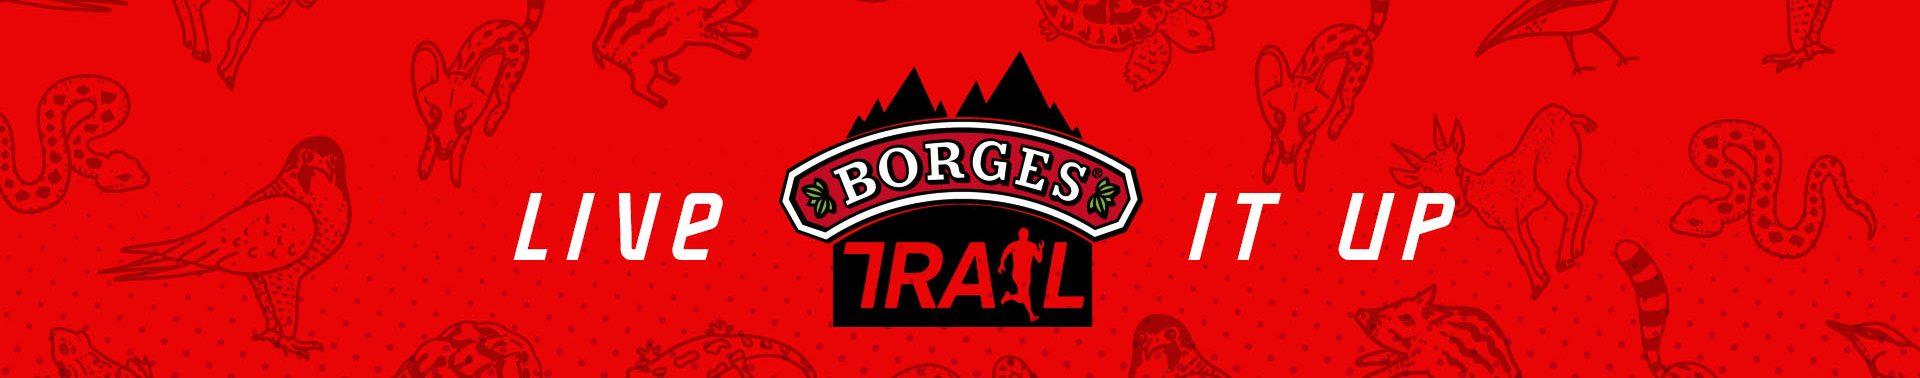 slider_borges_trail